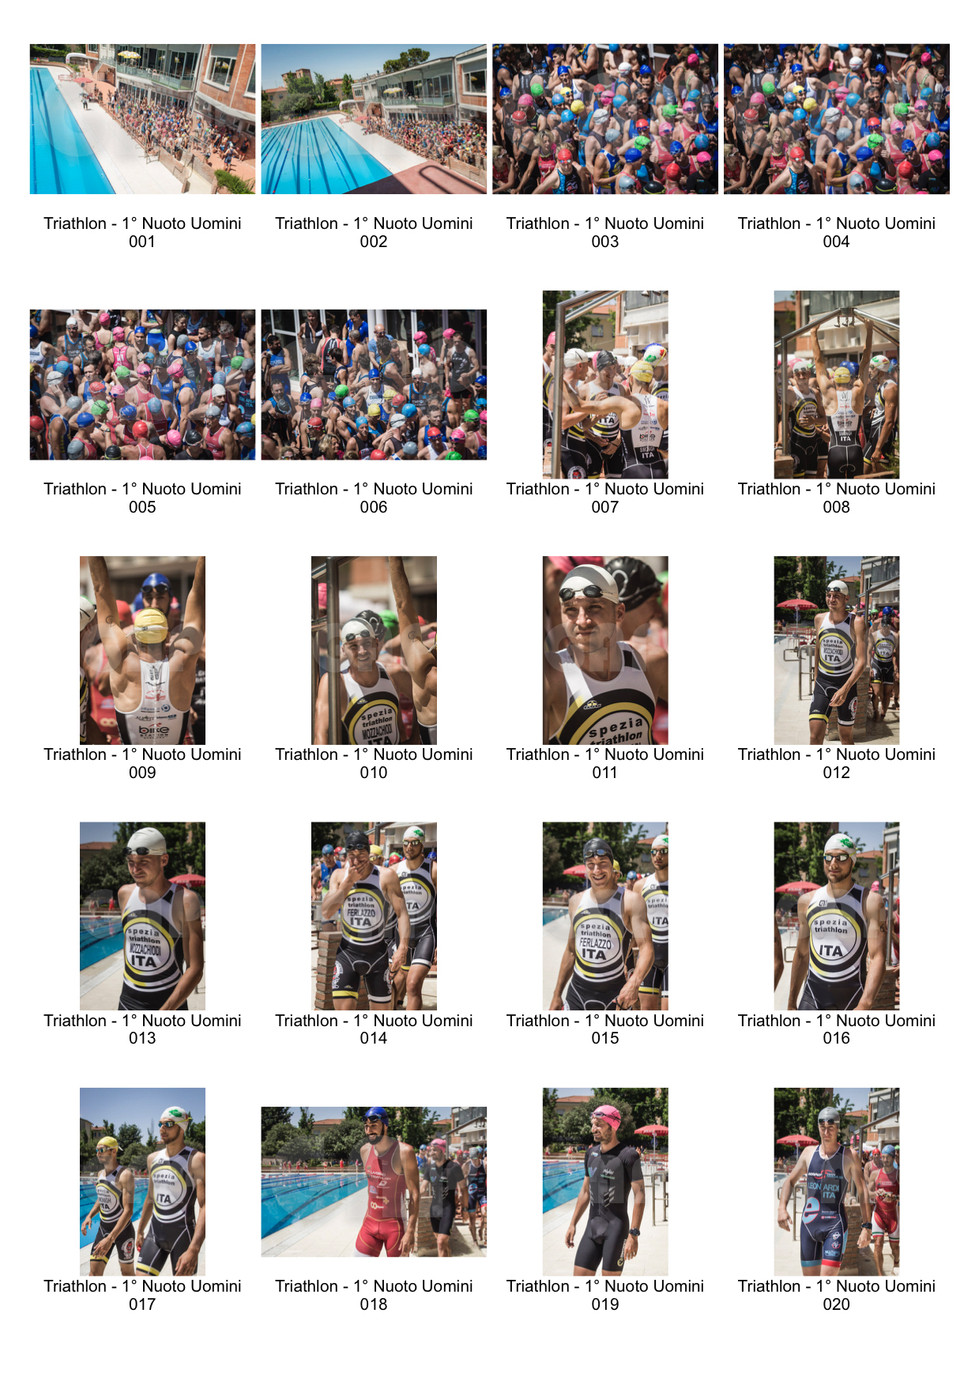 Triathlon_V.Elsa_-_1°_Frazione_Nuoto_Uomini_-01.jpg